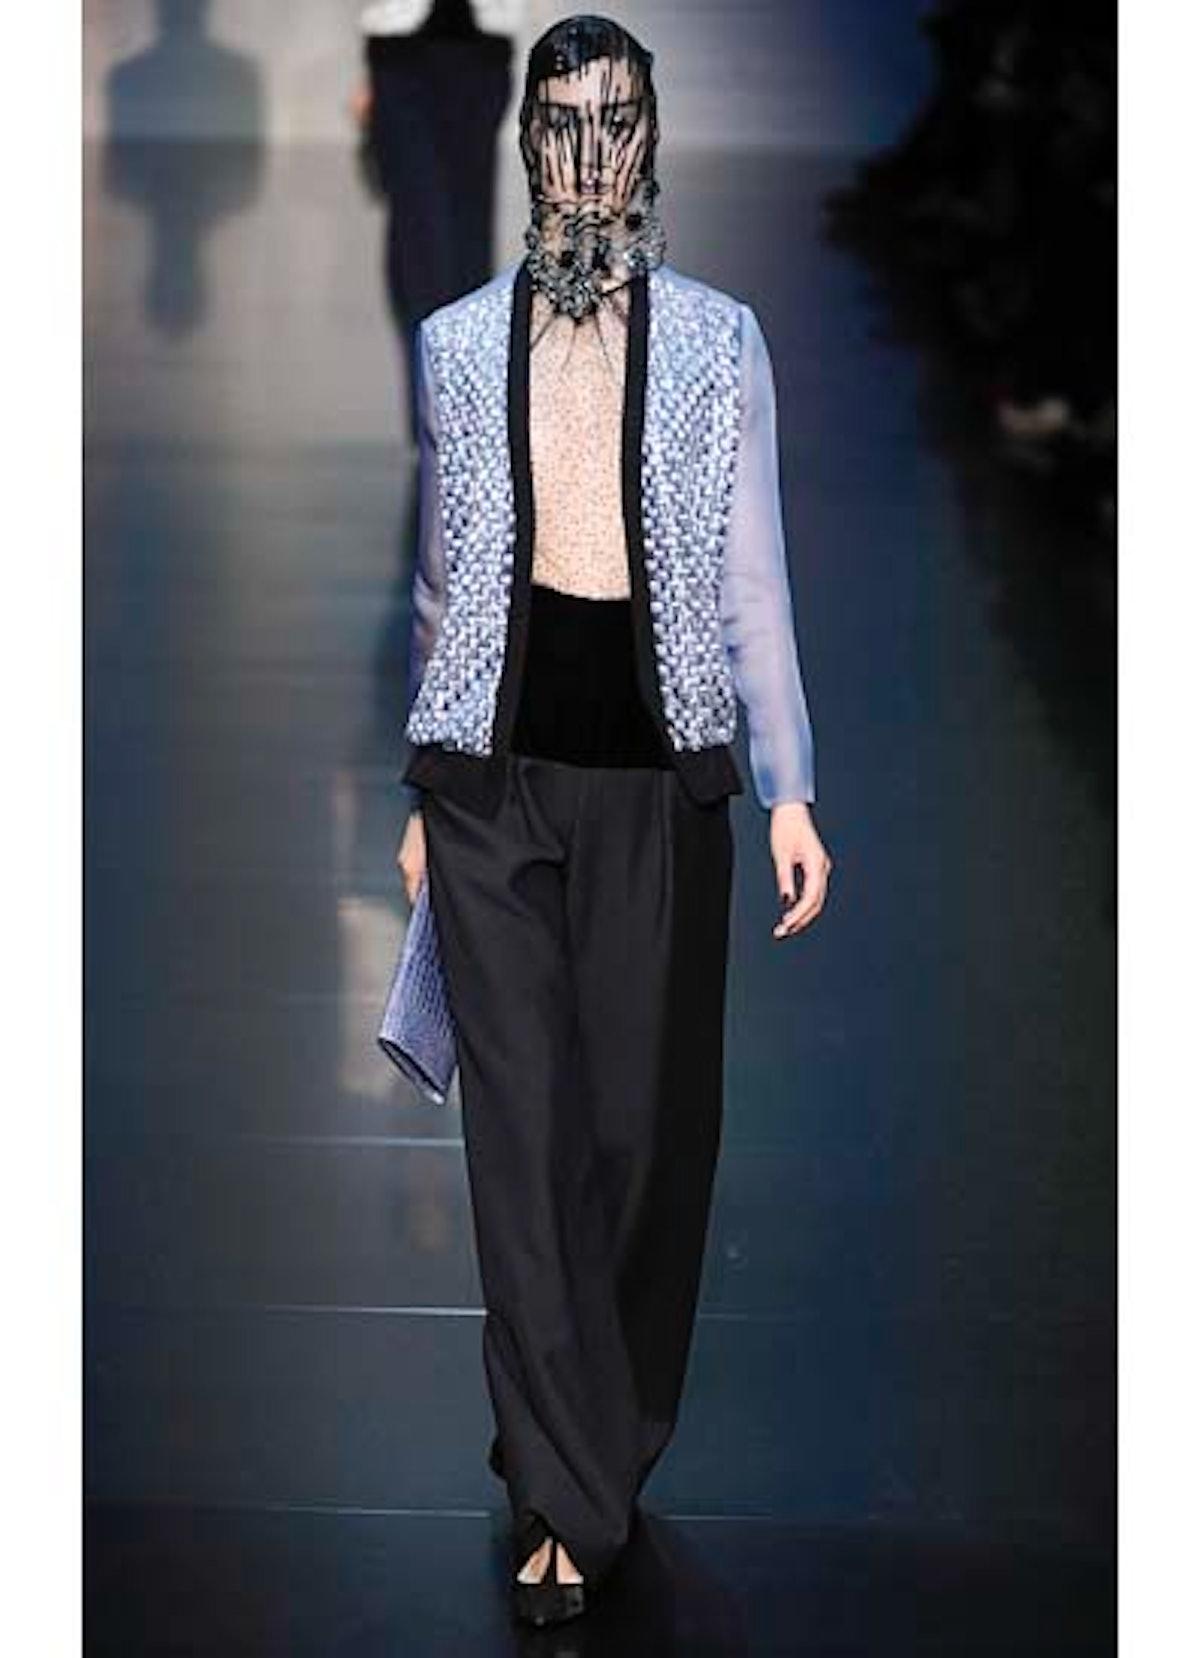 fass-giorgio-armani-couture-2012-runway-17-v.jpg